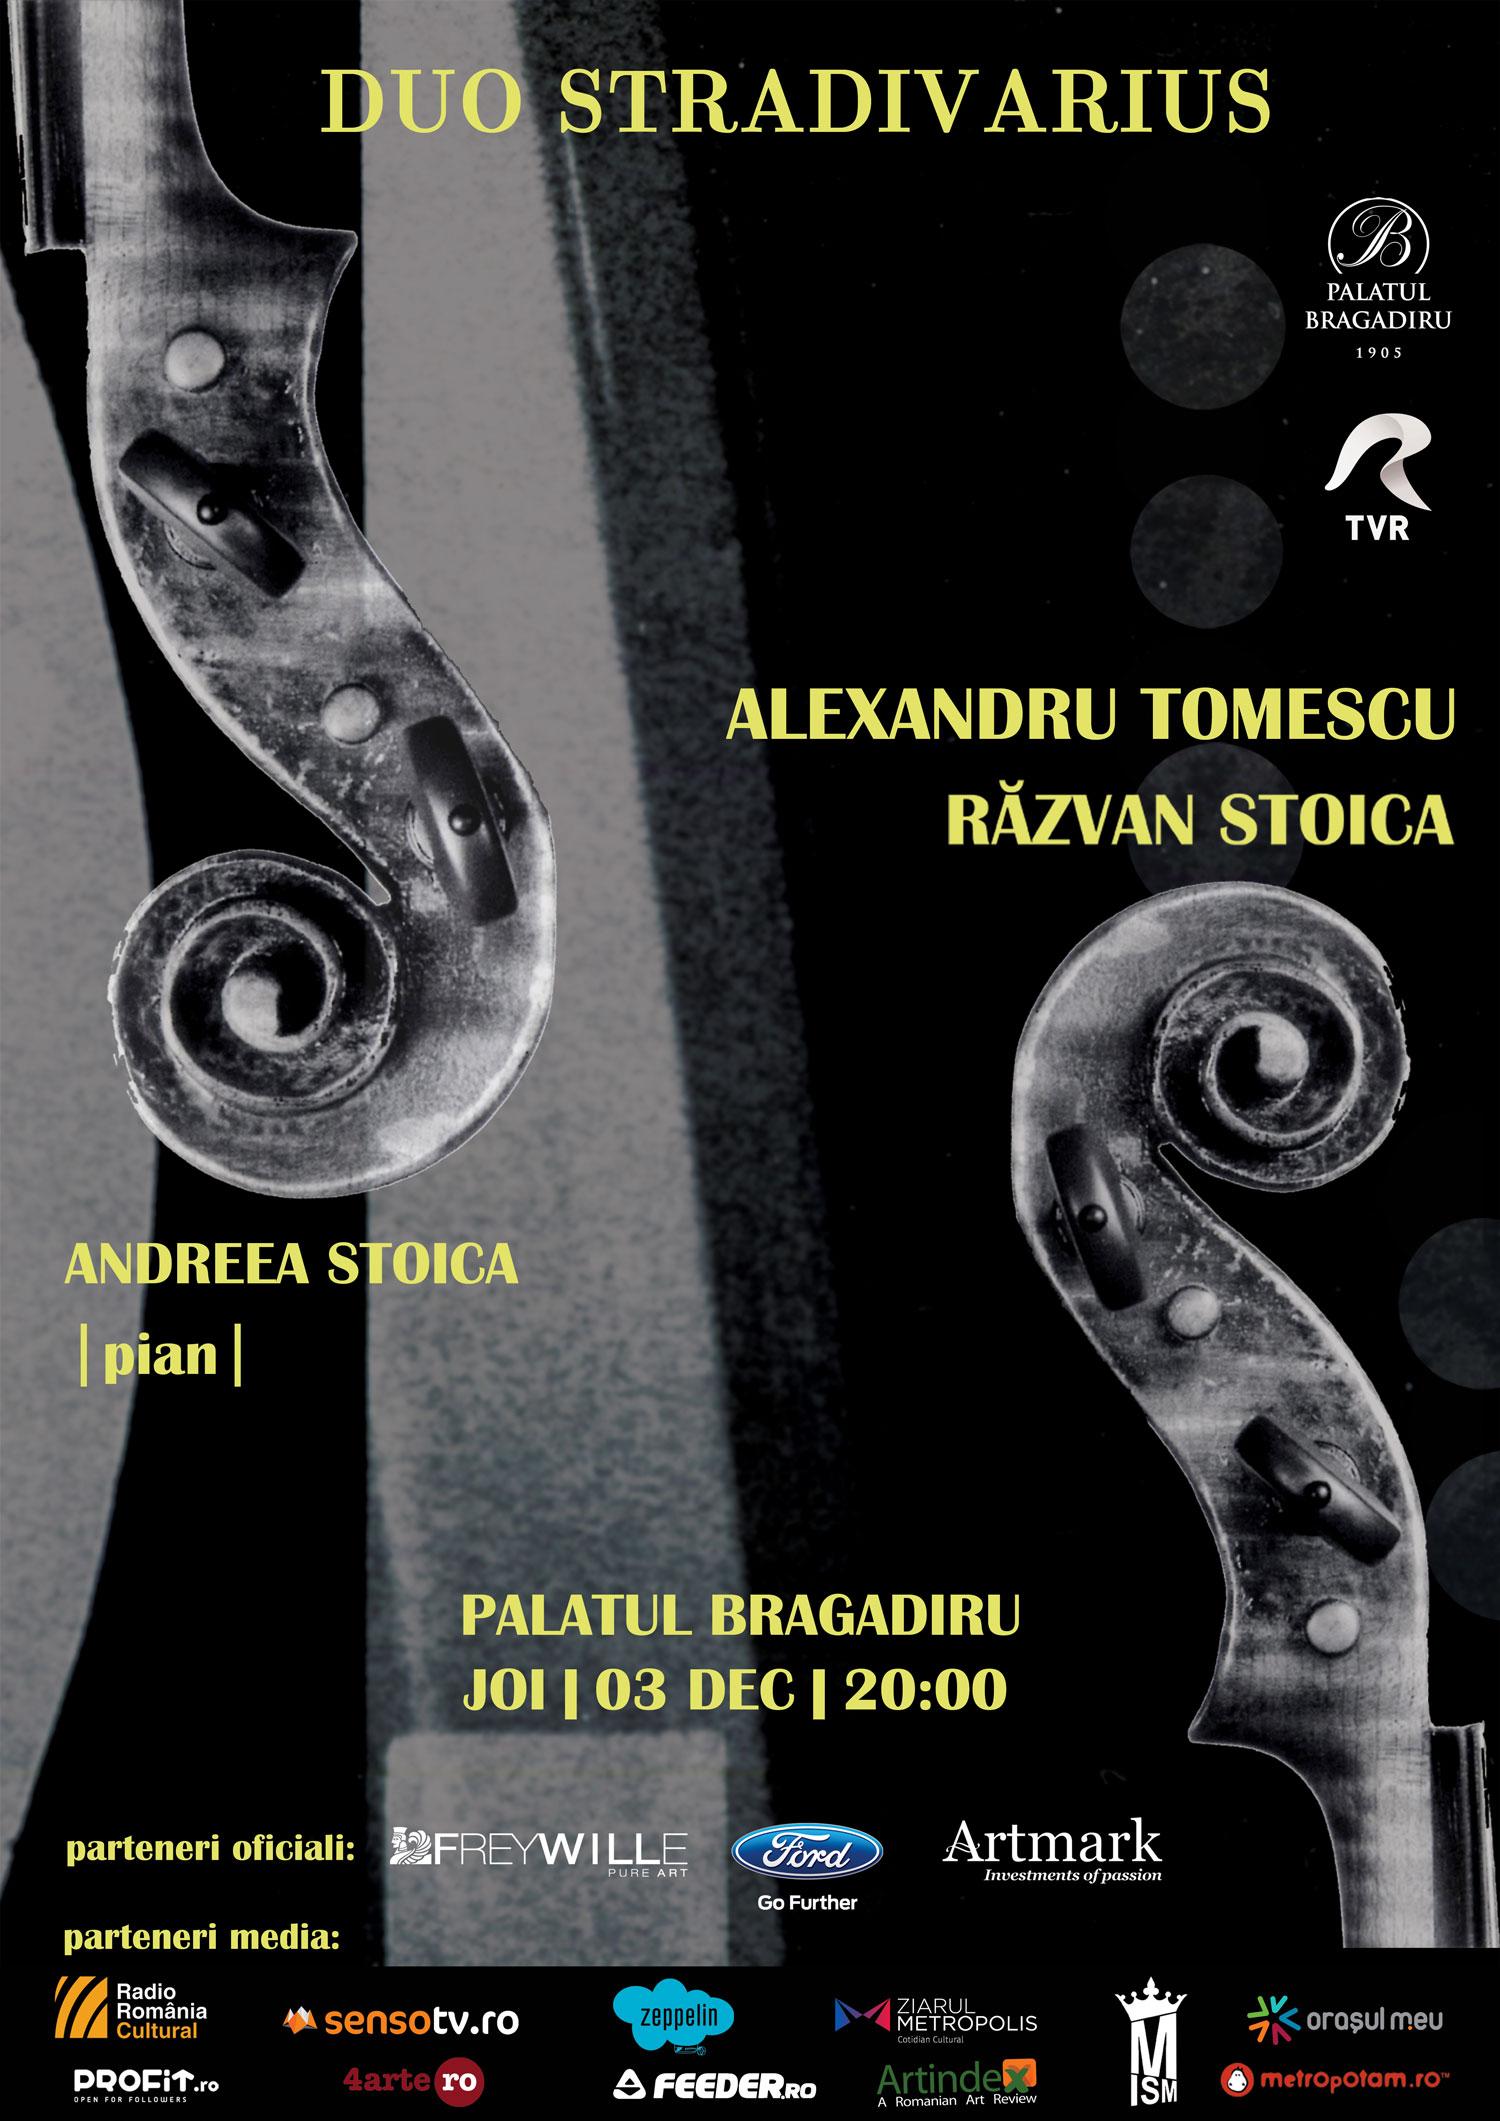 DUO-STRADIVARIUS--Alexandru-Tomescu-&-Razvan-Stoica-@-Palatul-Bragadiru